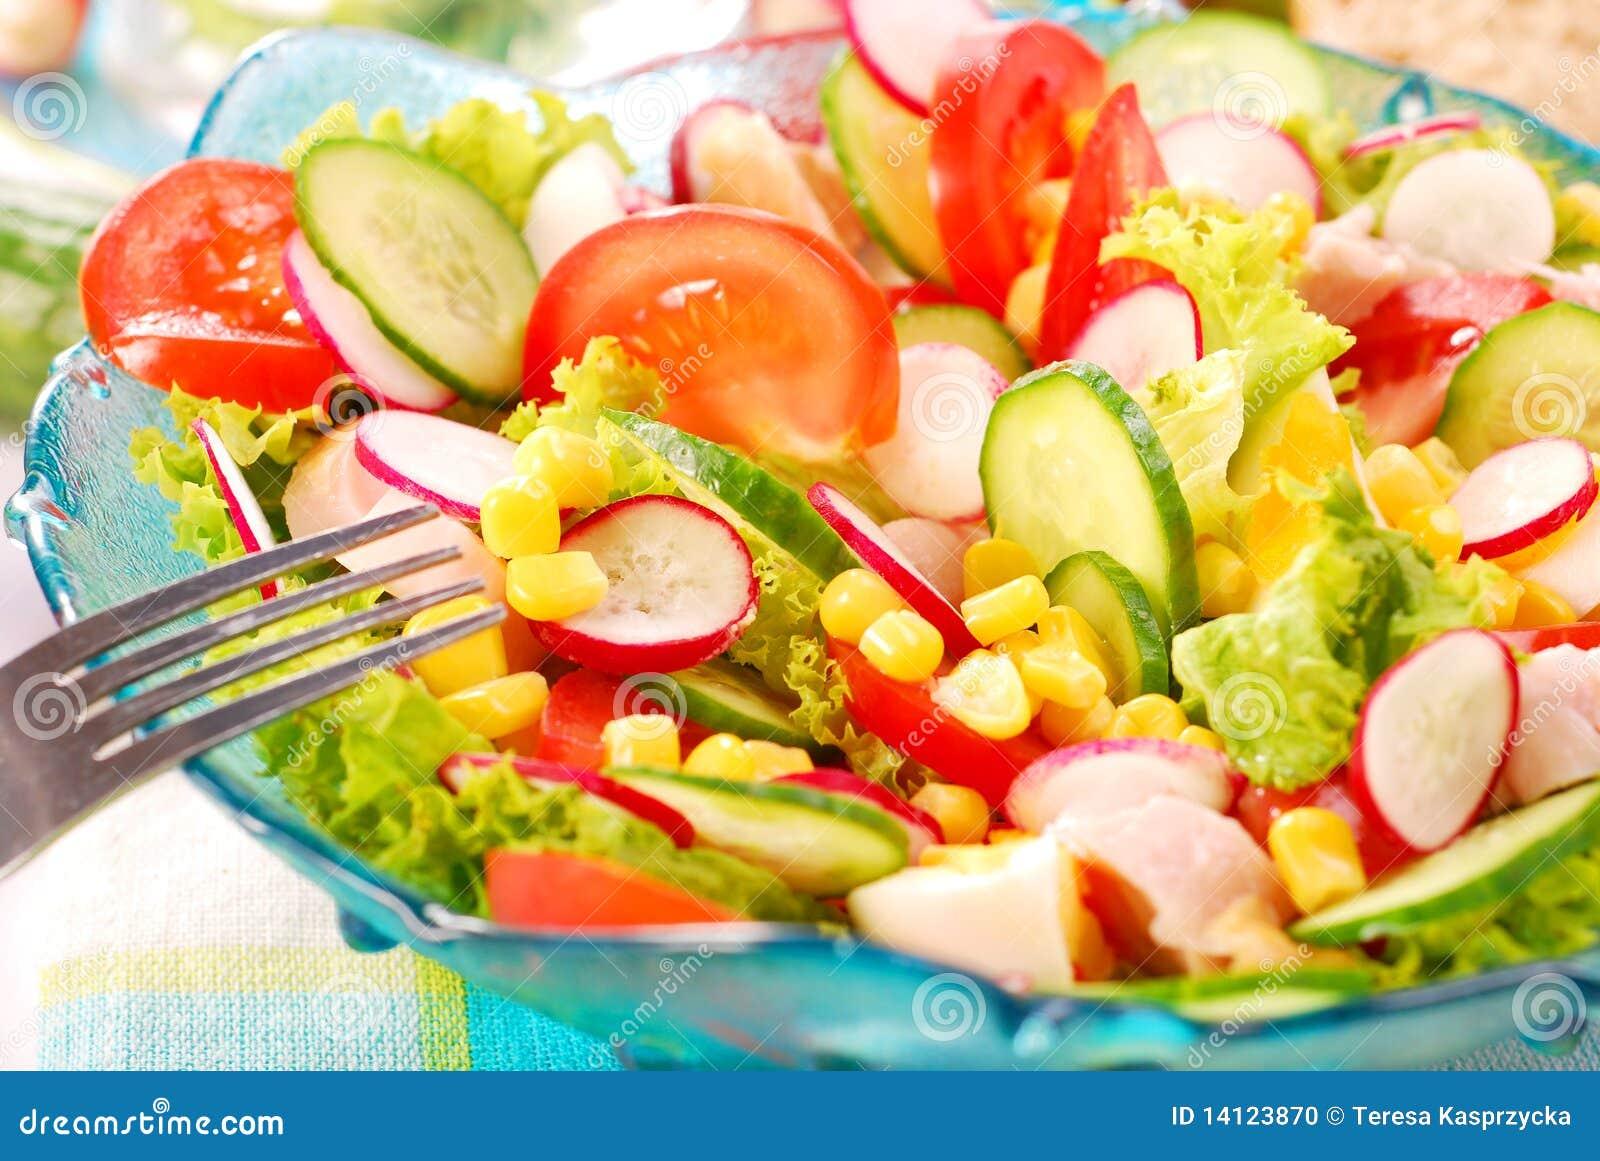 Verse salade met gerookte kip stock foto afbeelding for Vers des salades